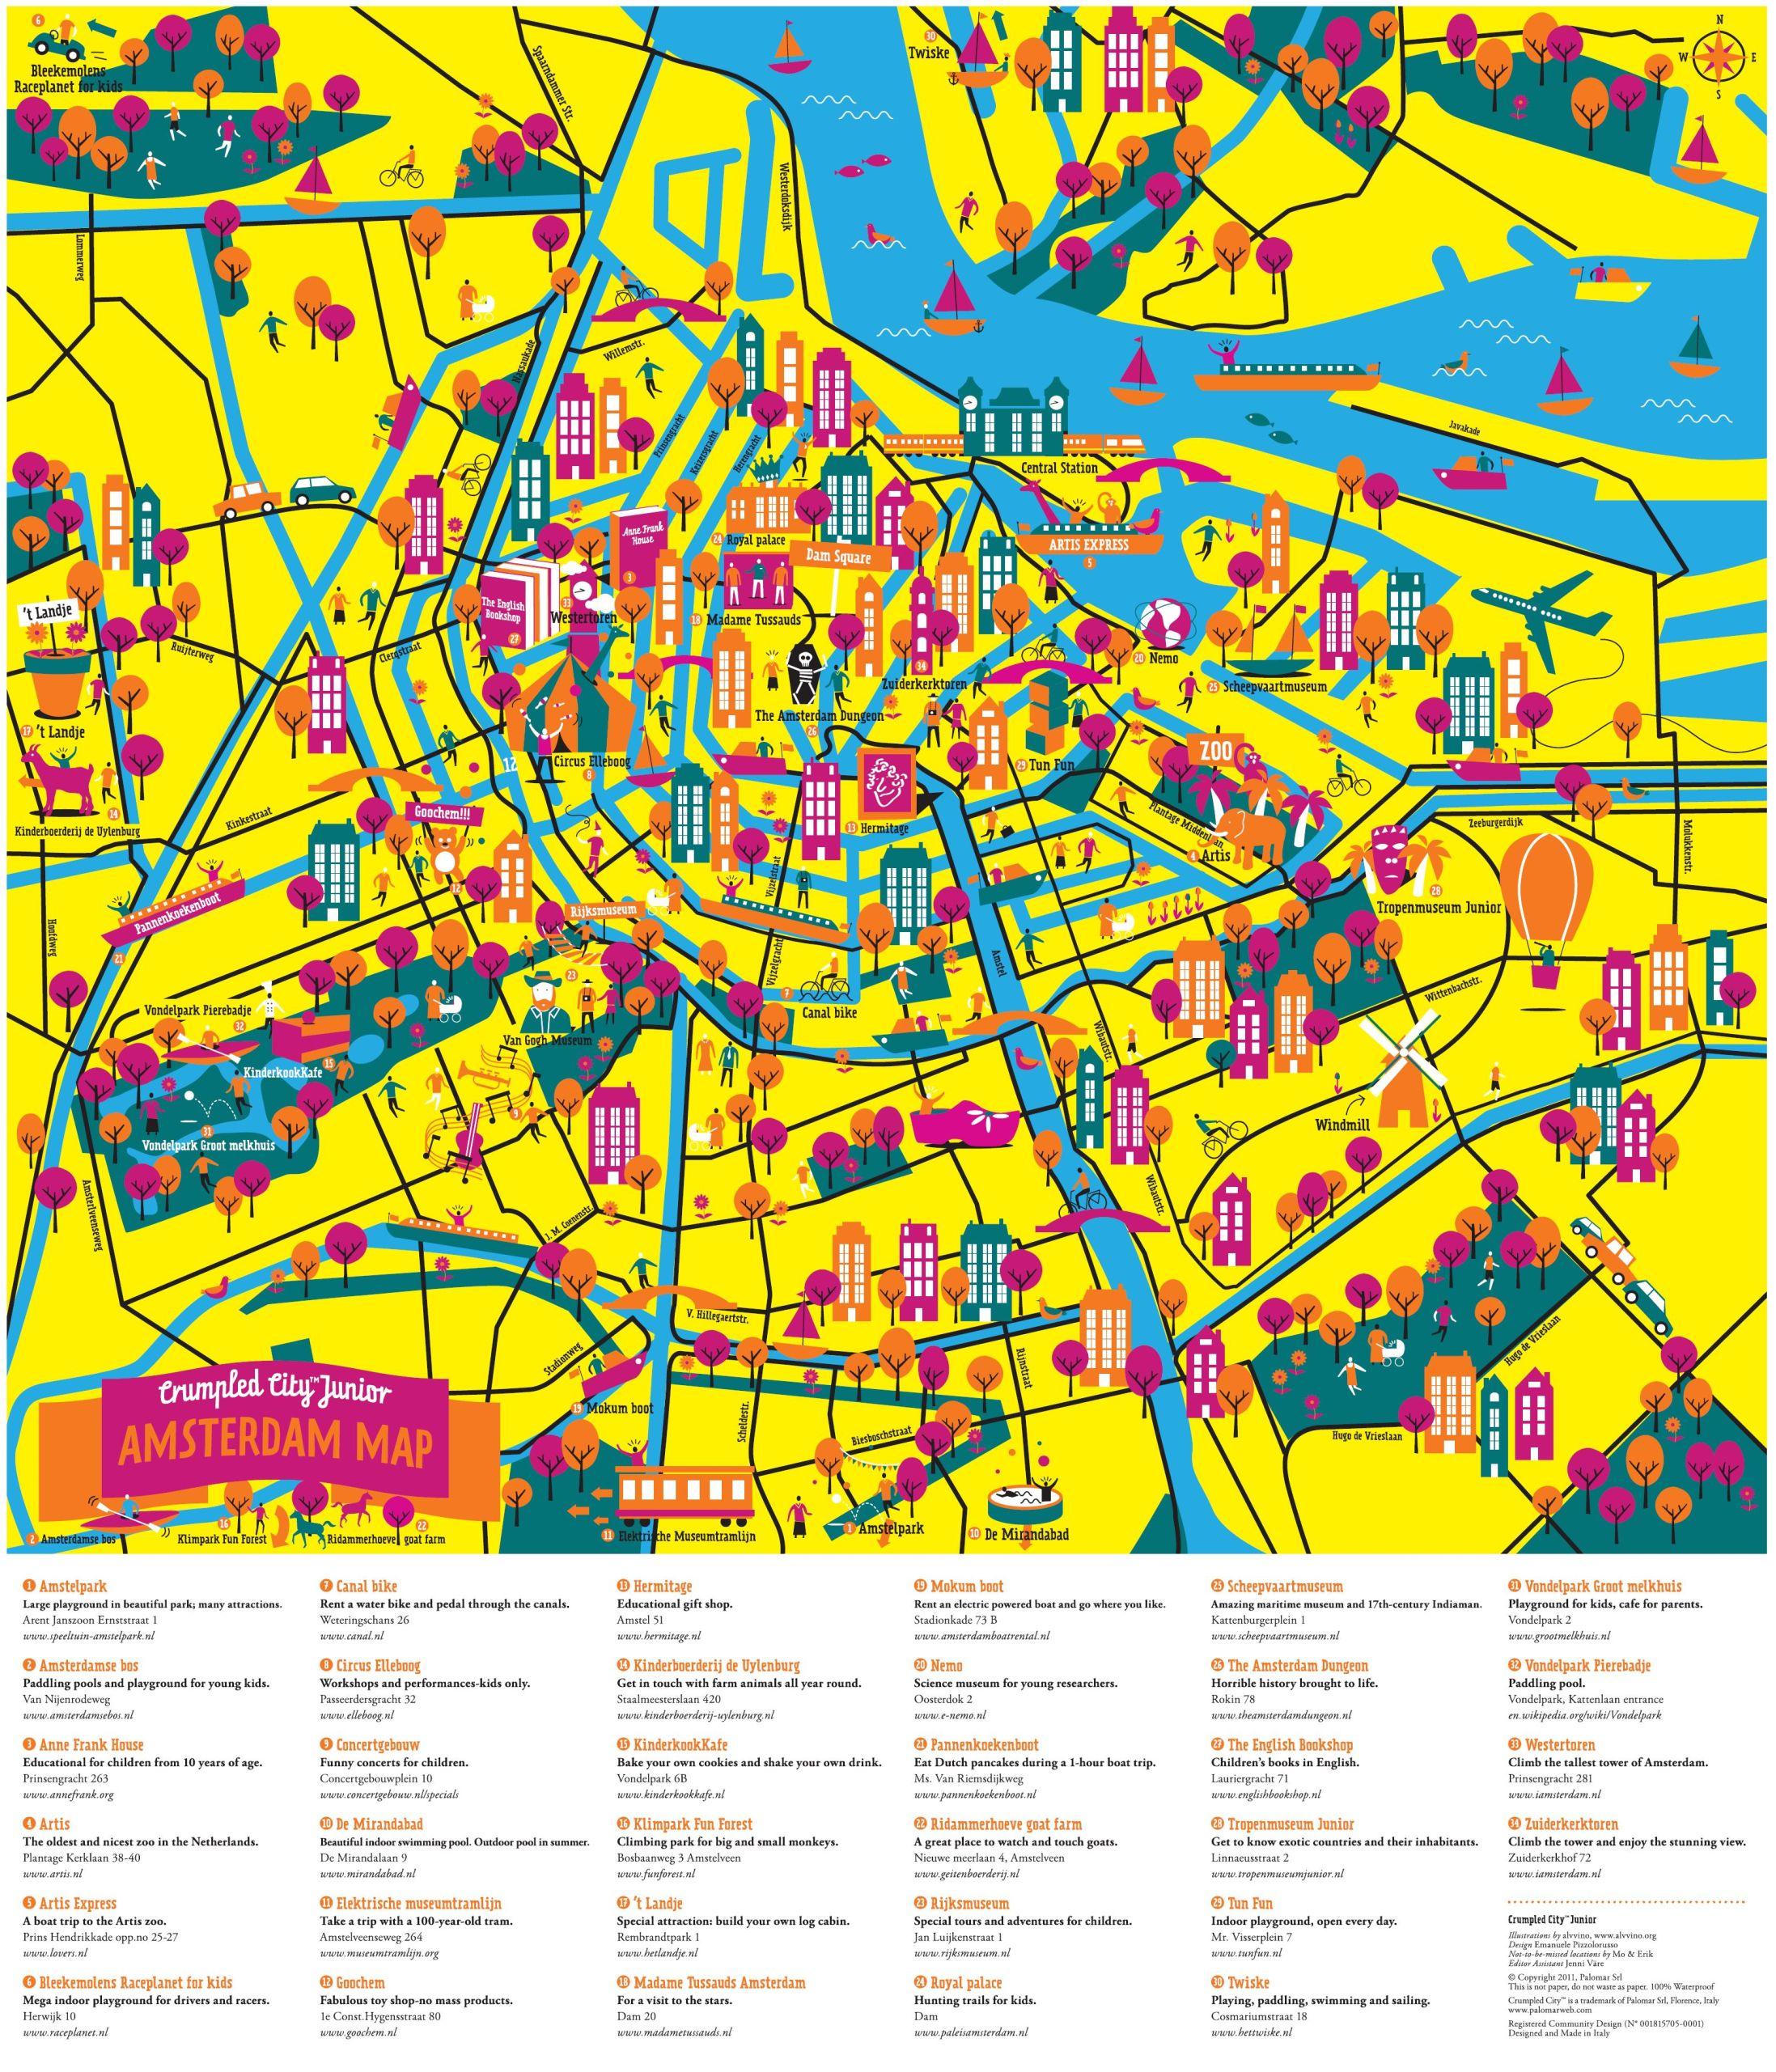 City Väskan : Designbutiken com palomar crumble city family paris